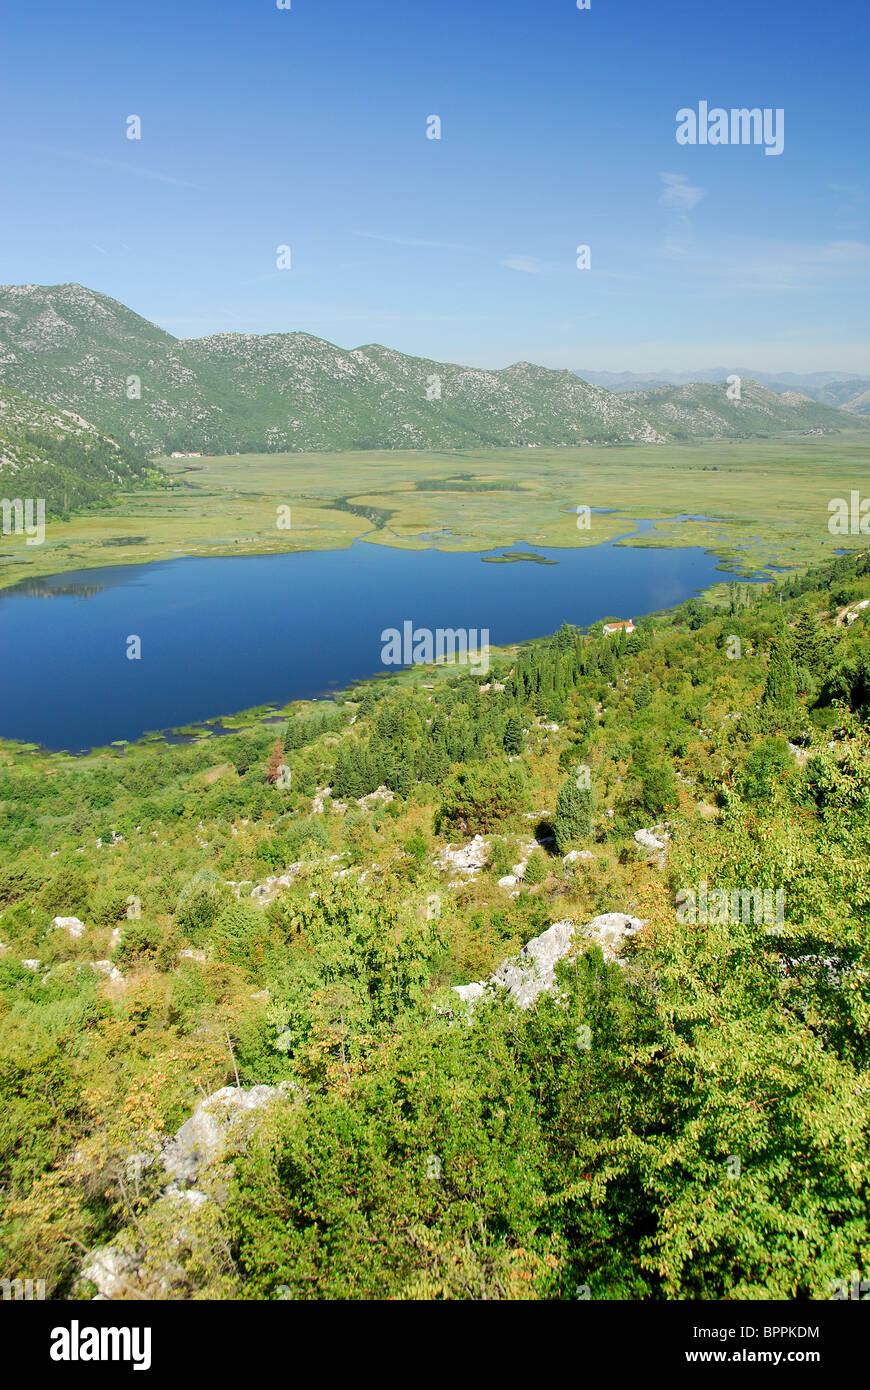 CROATIA. A view of the Neretva delta near Ploce in southern Dalmatia, as seen from the Croatia - Bosnia border. - Stock Image